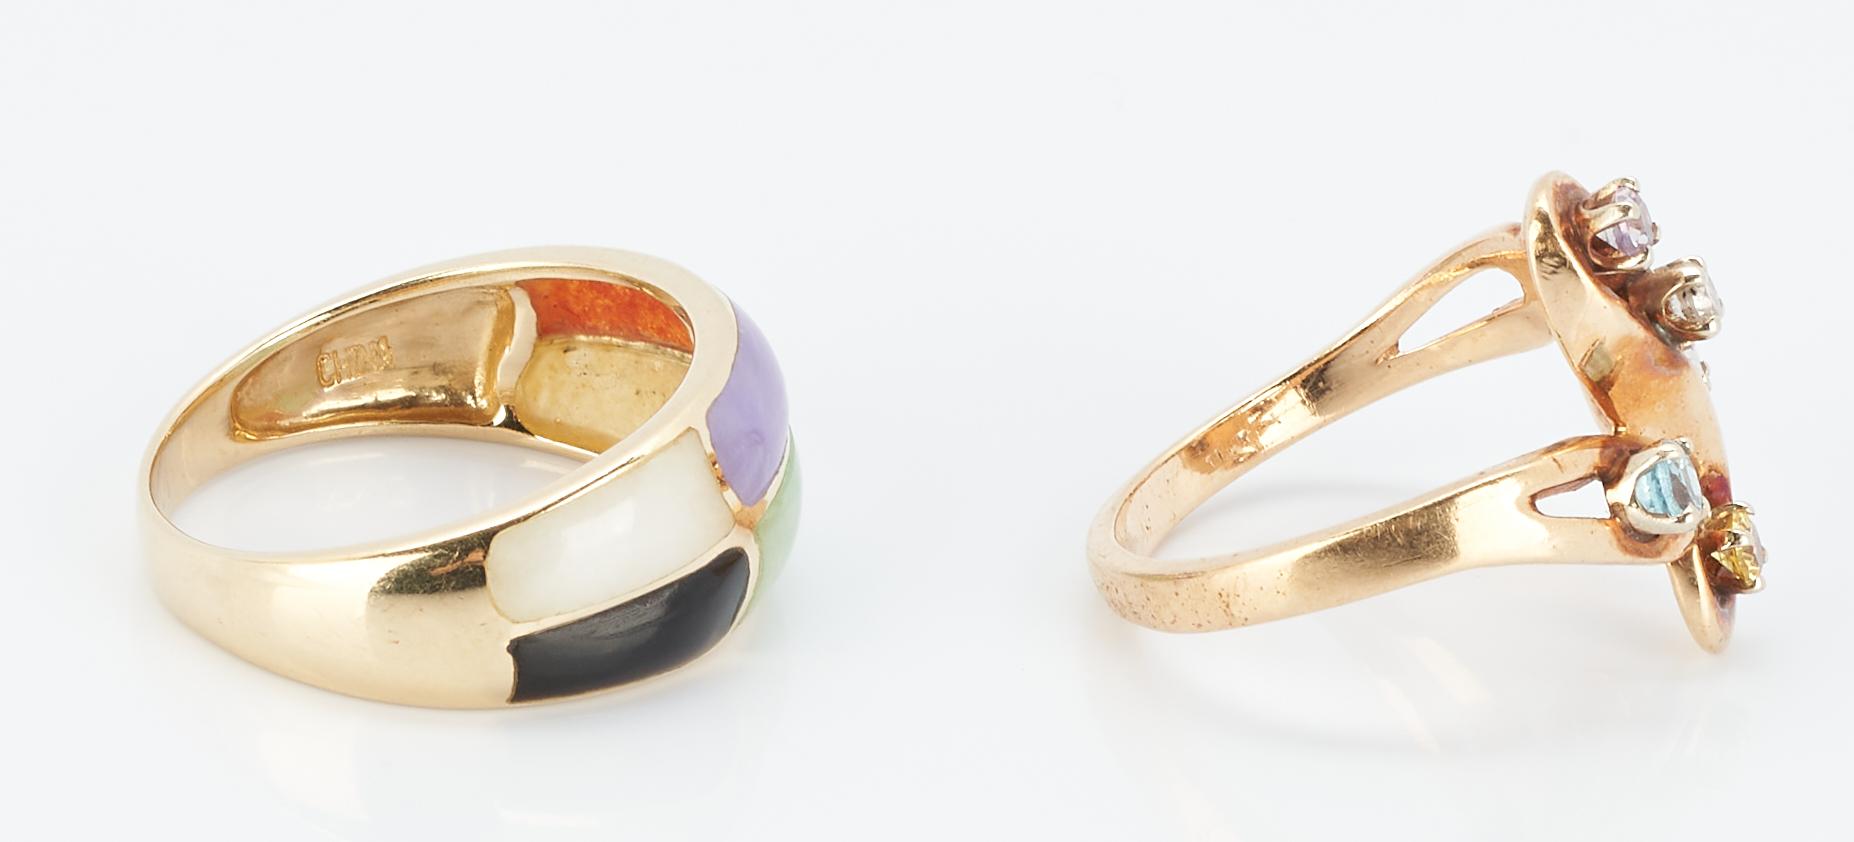 Lot 847: 18K Gemstone Bracelet & 2 14K Gemstone Rings